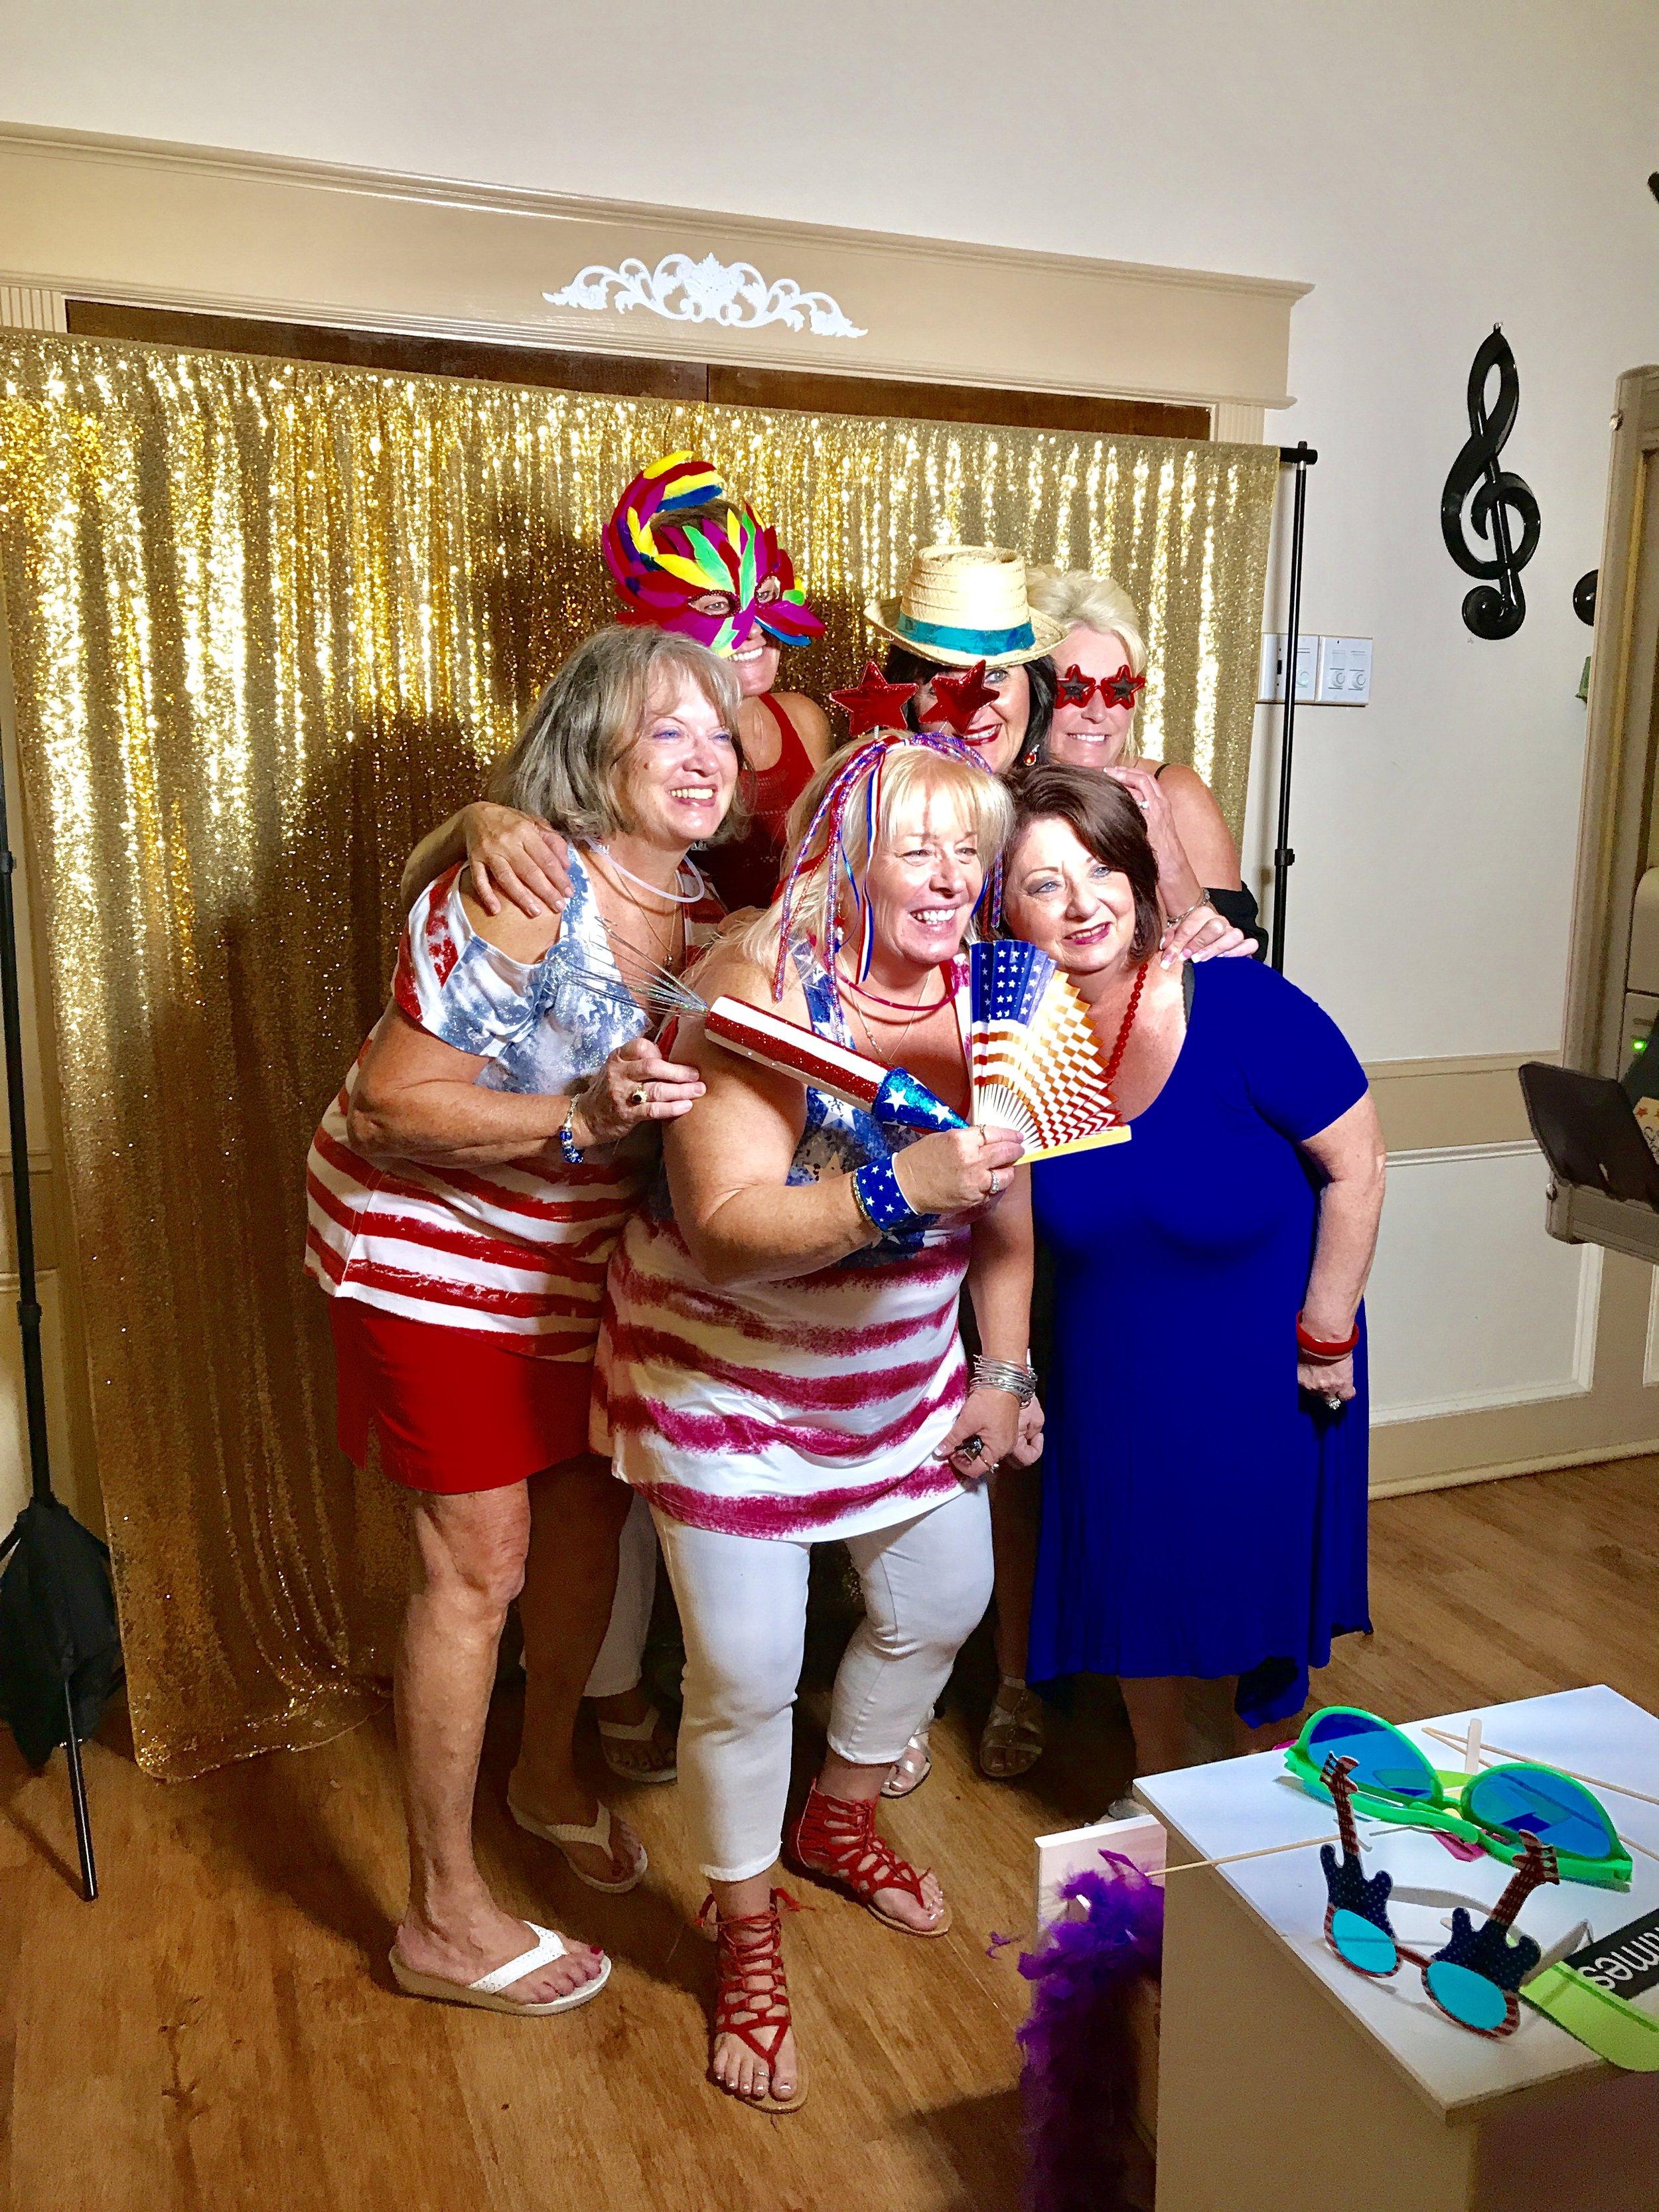 Reunion photo booth in Bradenton FL.